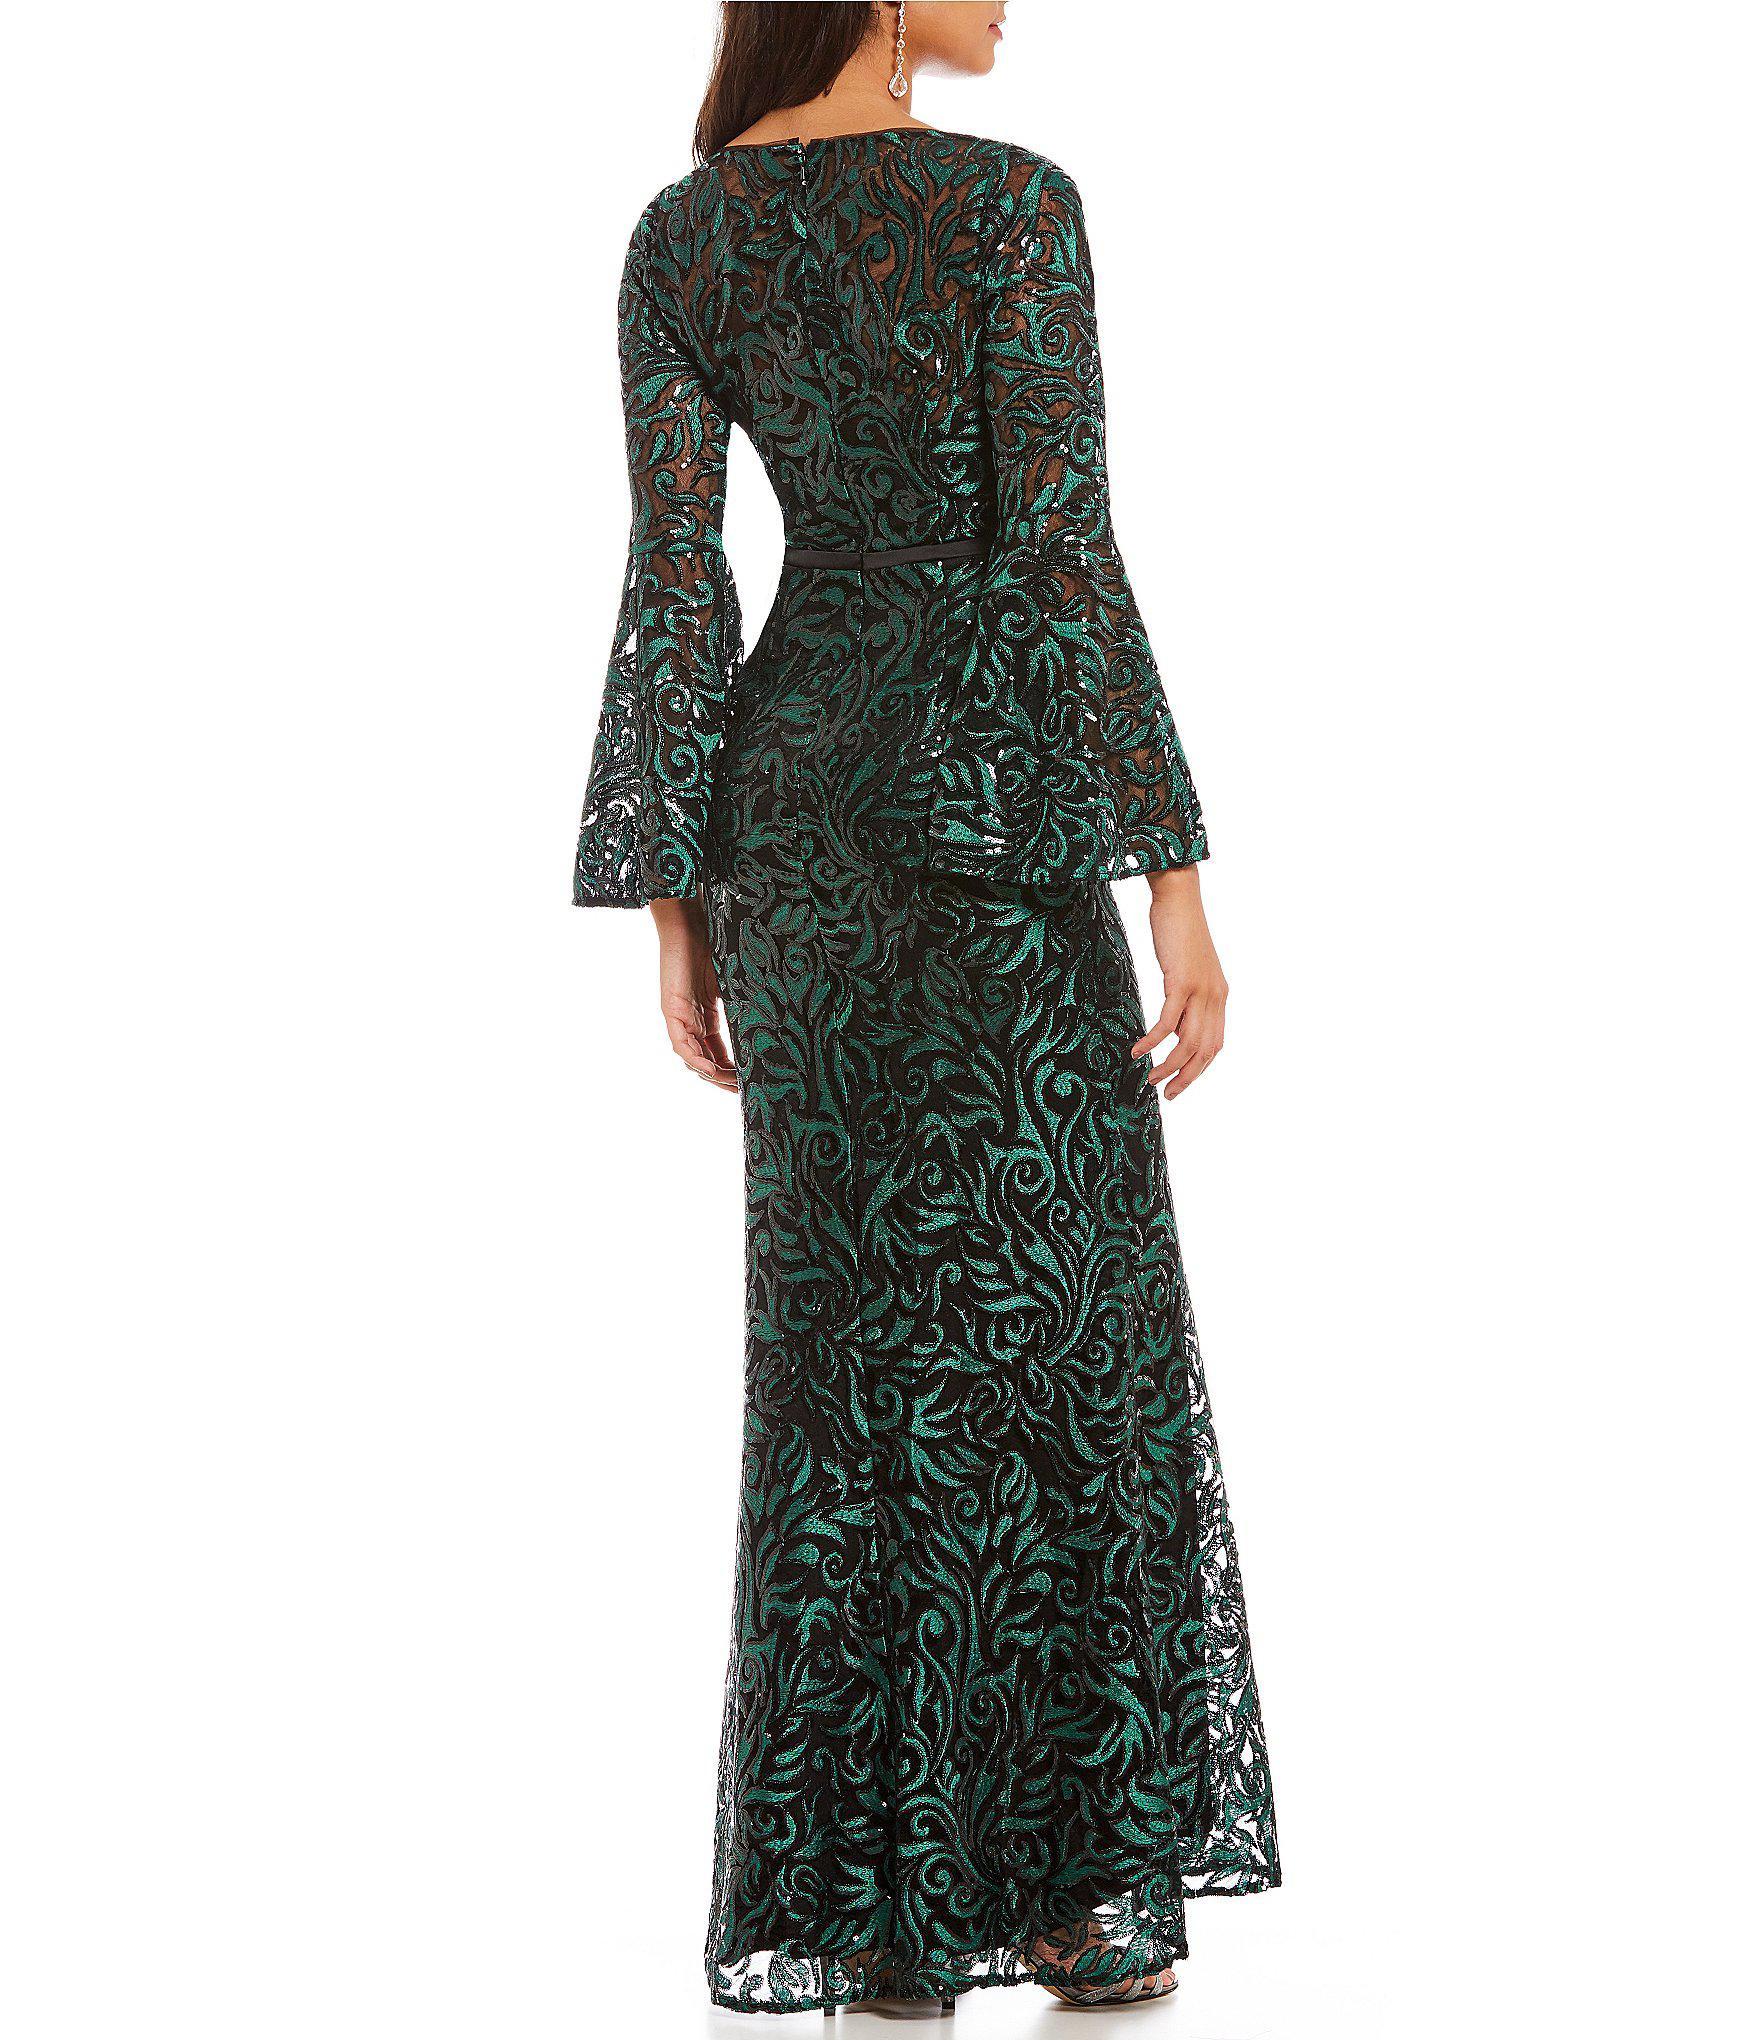 37c396db9e73da Carmen Marc Valvo Sequin Embroidered Trumpet Gown in Green - Lyst